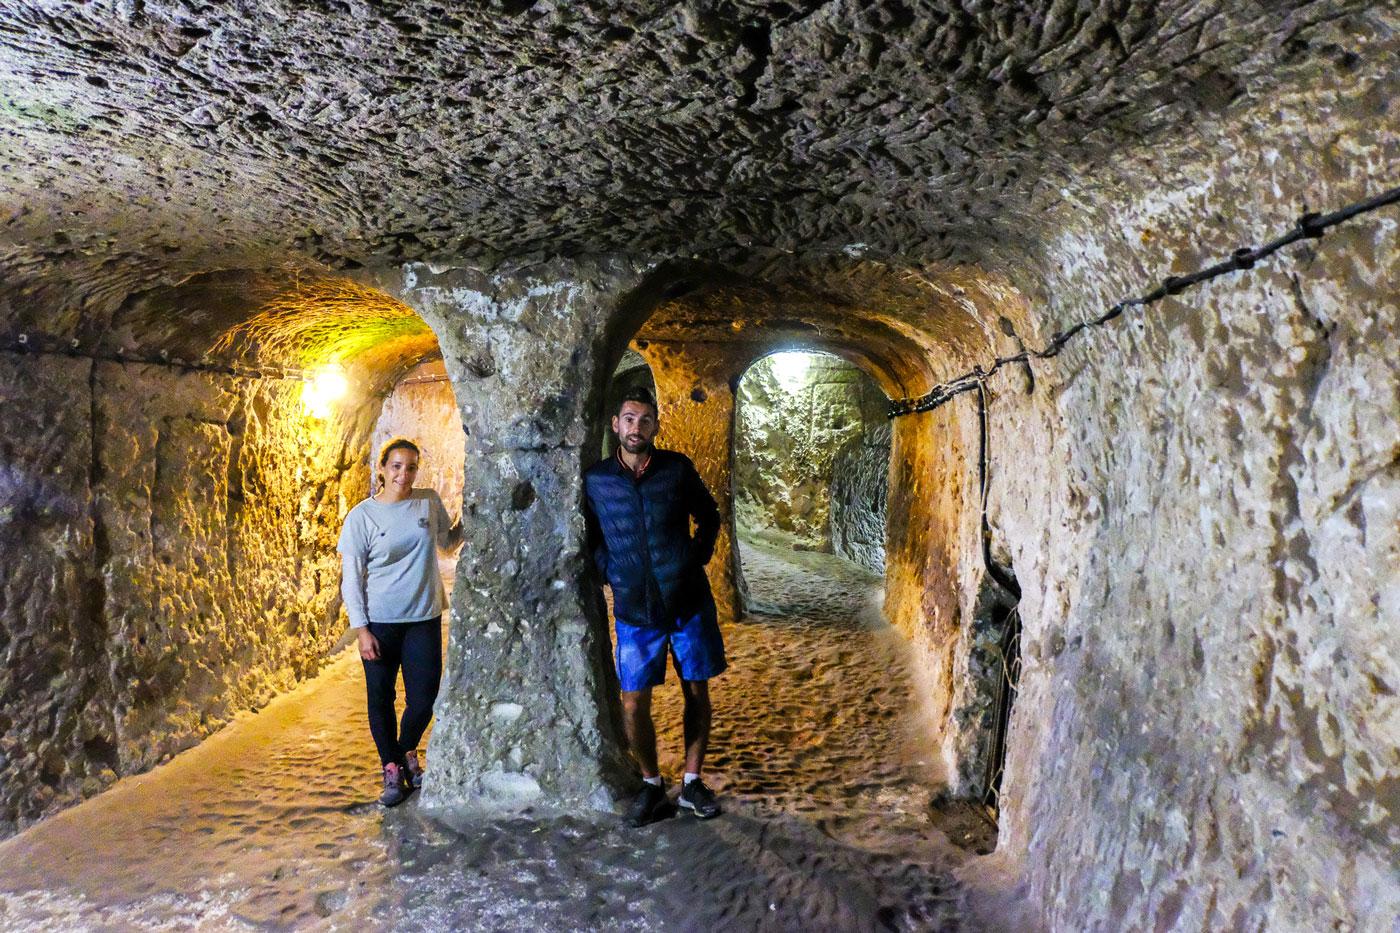 Turkey cycling, underground city of Derinkuyu. Cycling Turquey, underground city of Derinkuyu.